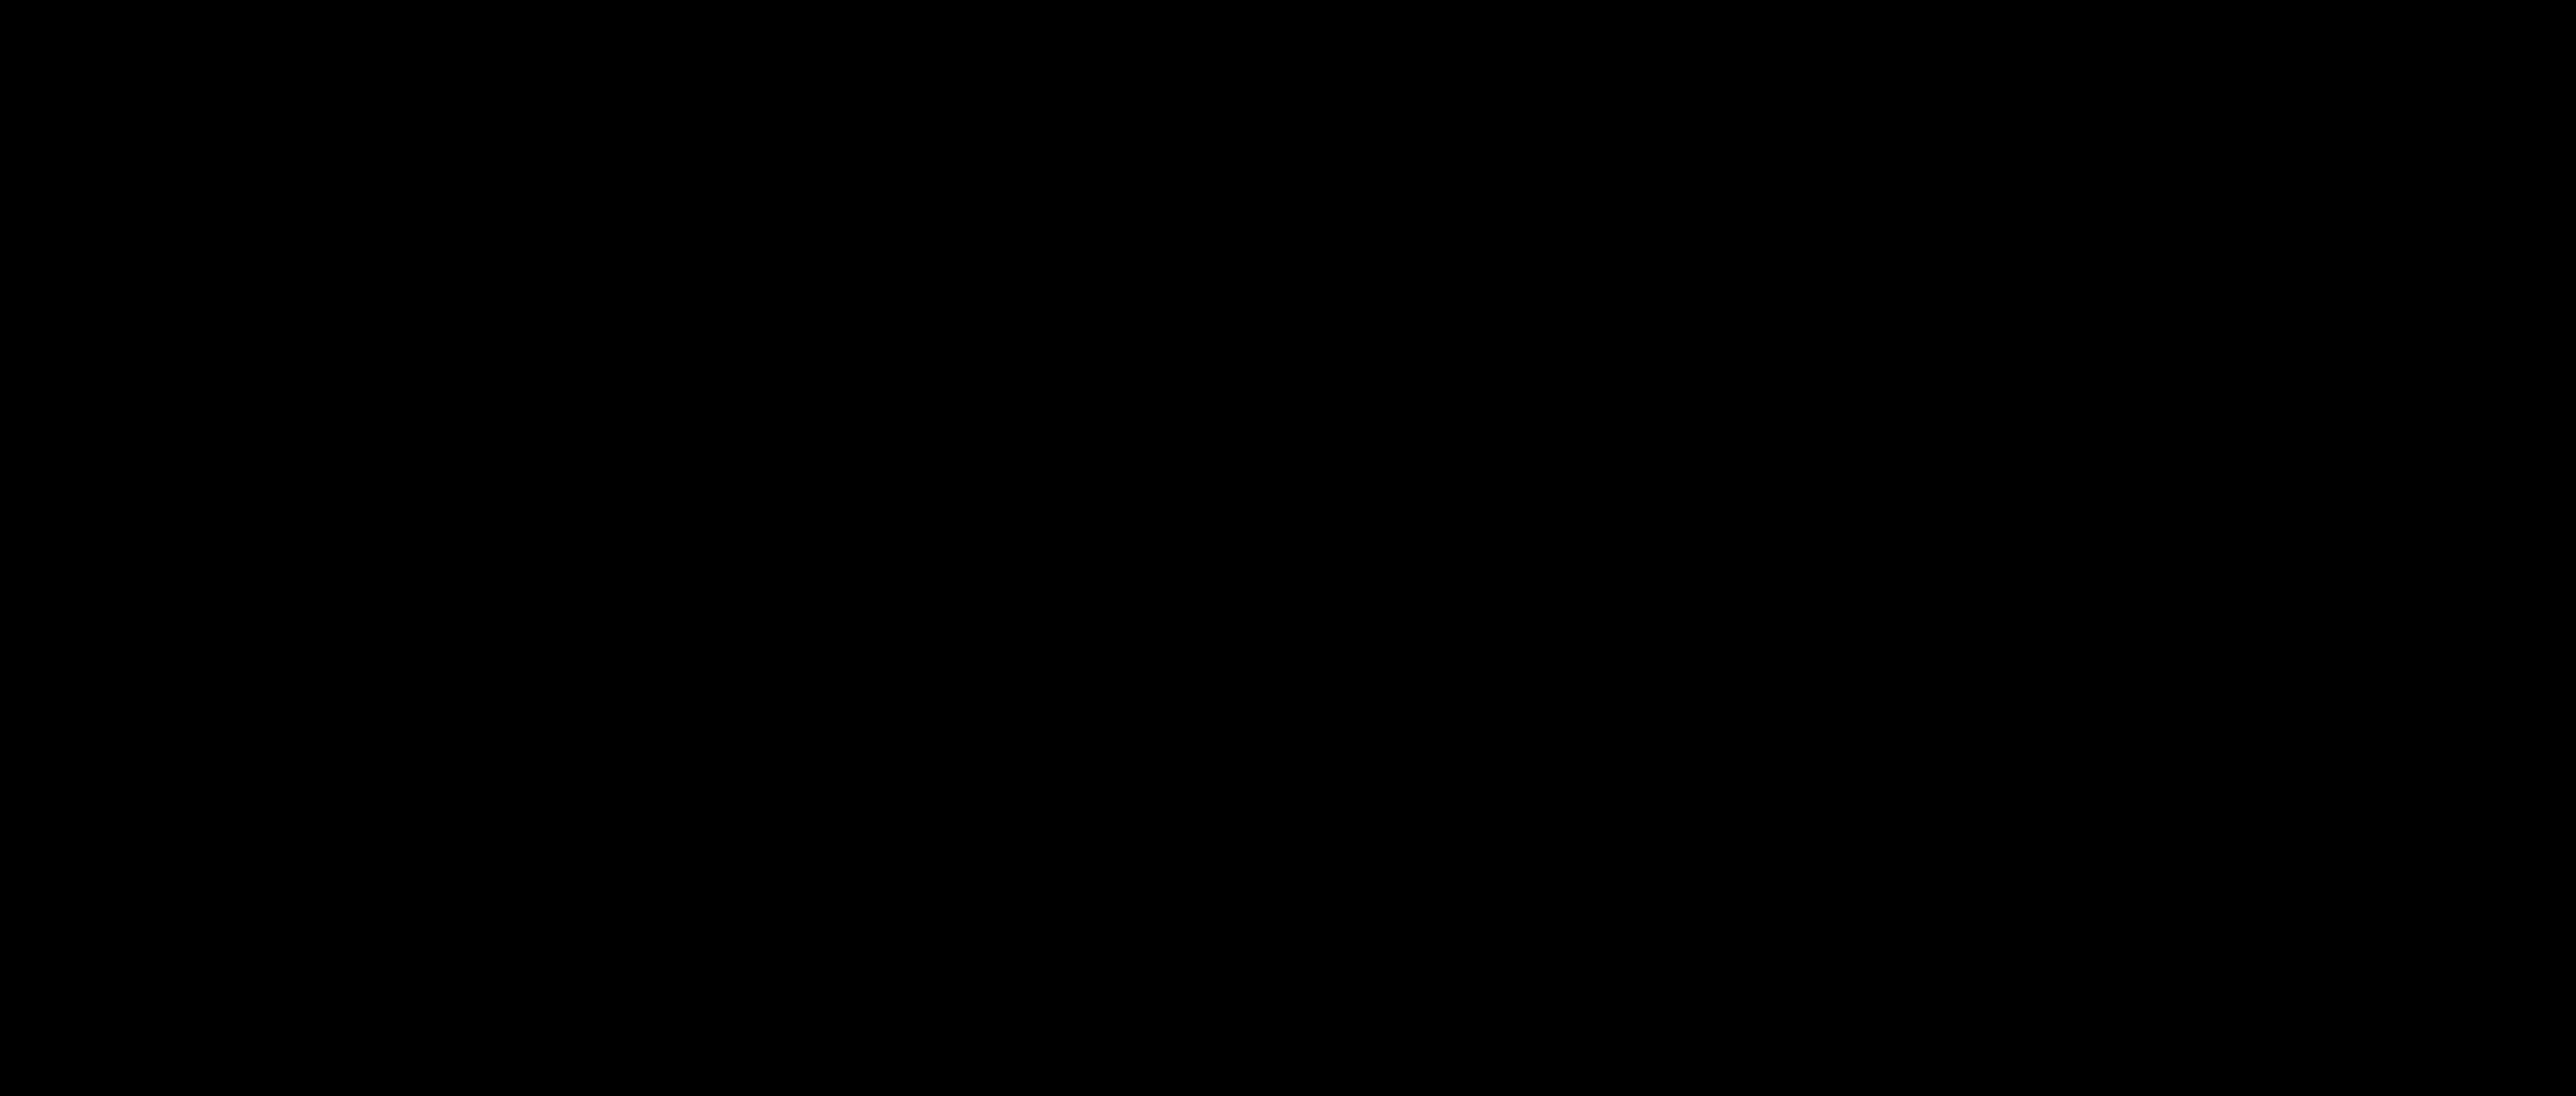 Firefly clipart svg. Black art file logotypeg